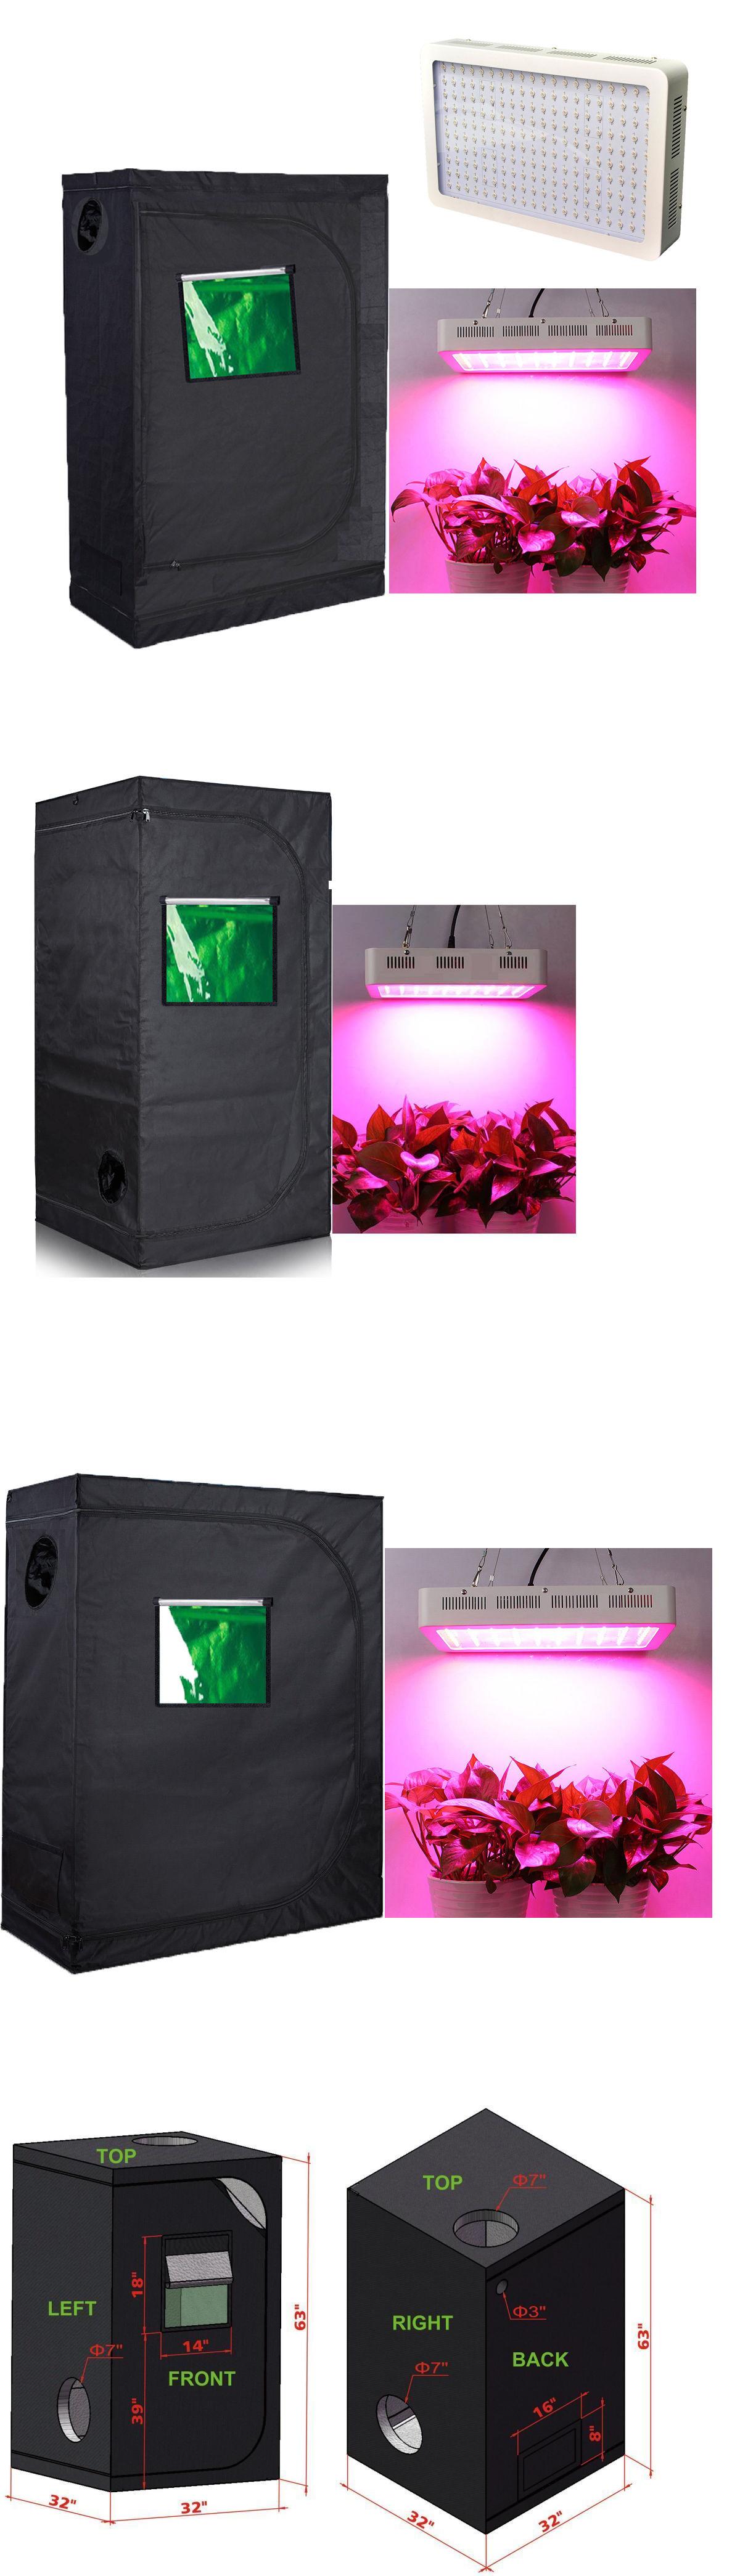 co kit lighting watt lamp spectrum dual dp reflector amazon hps outdoors light uk ballast grow pro kits garden